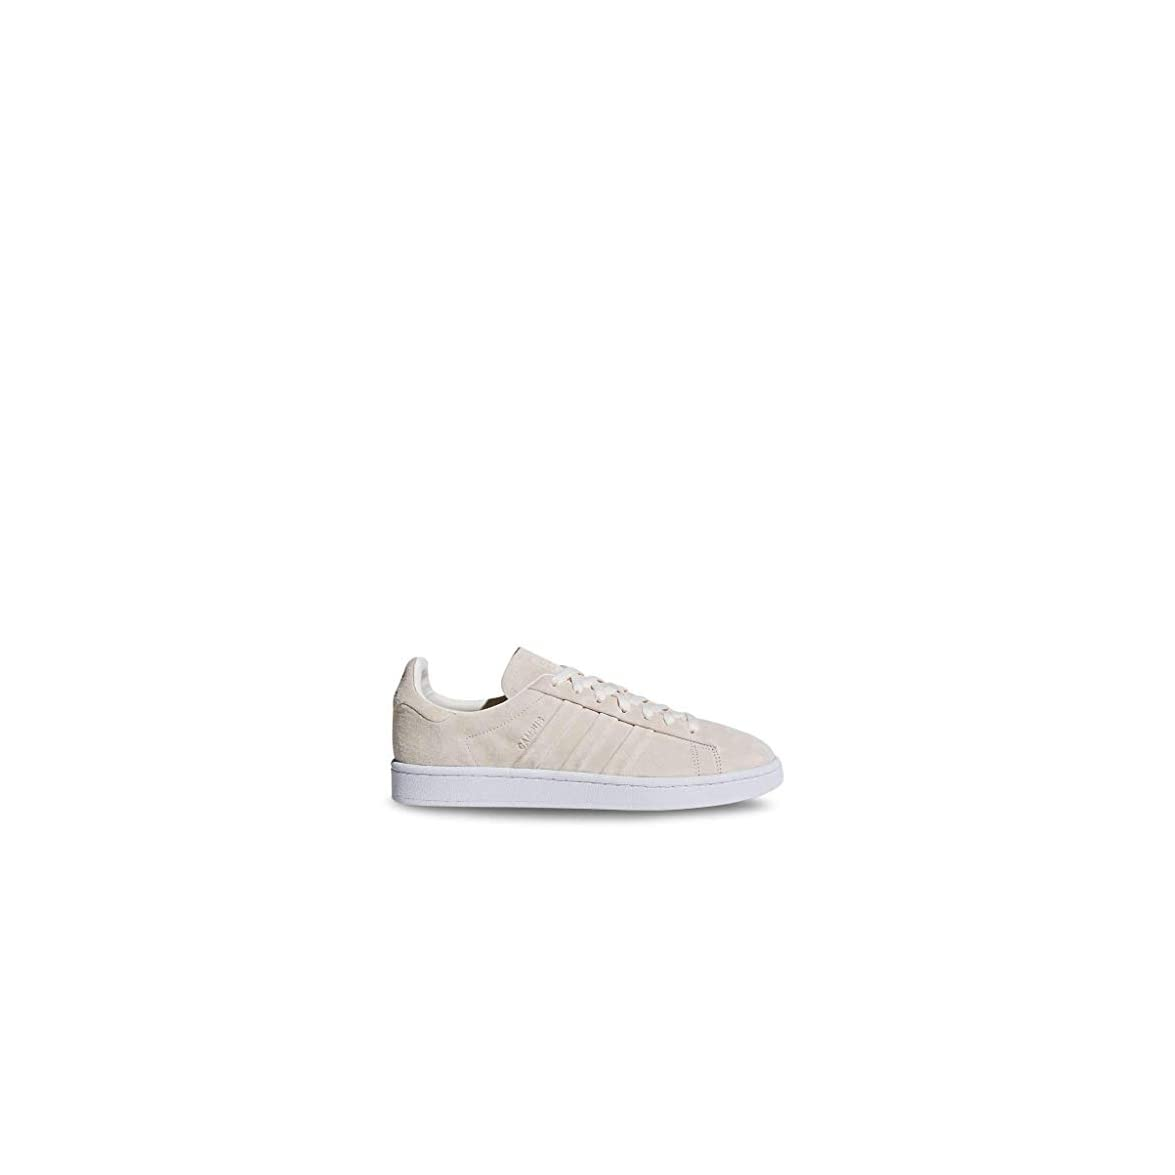 Scarpe Basse Sneakers Donna Bianco campus - Adidas